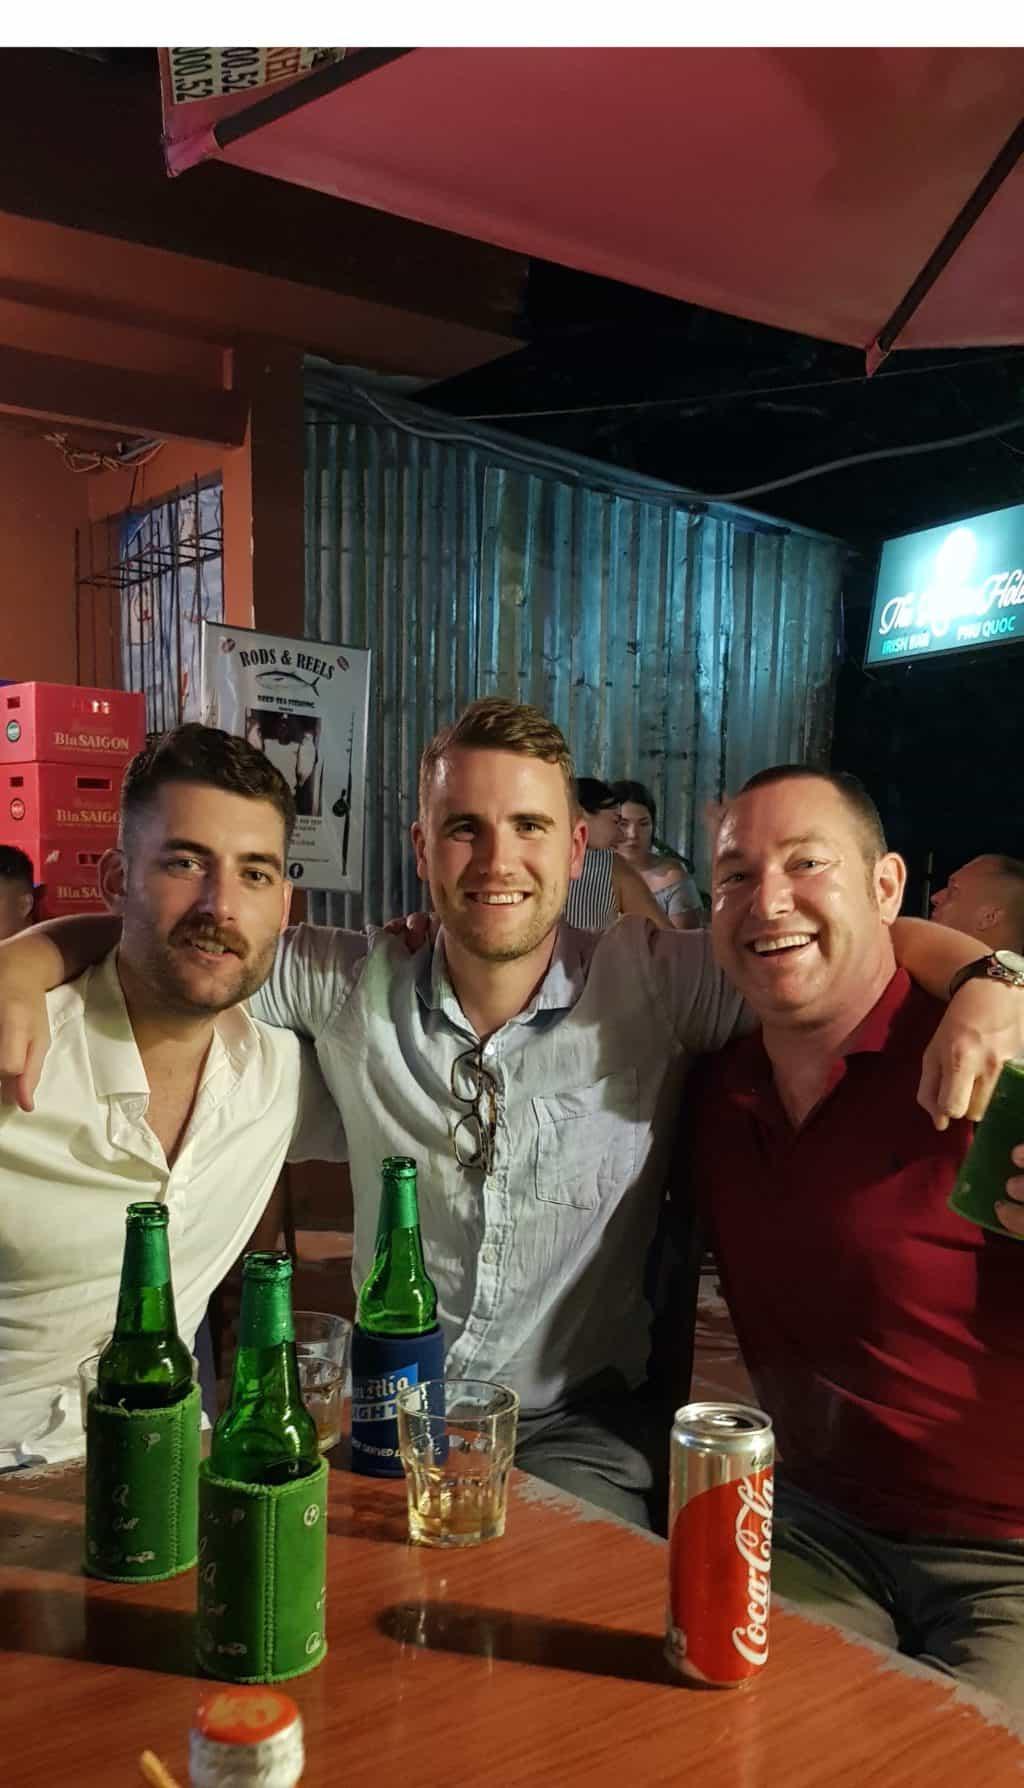 Party-at-the-bar